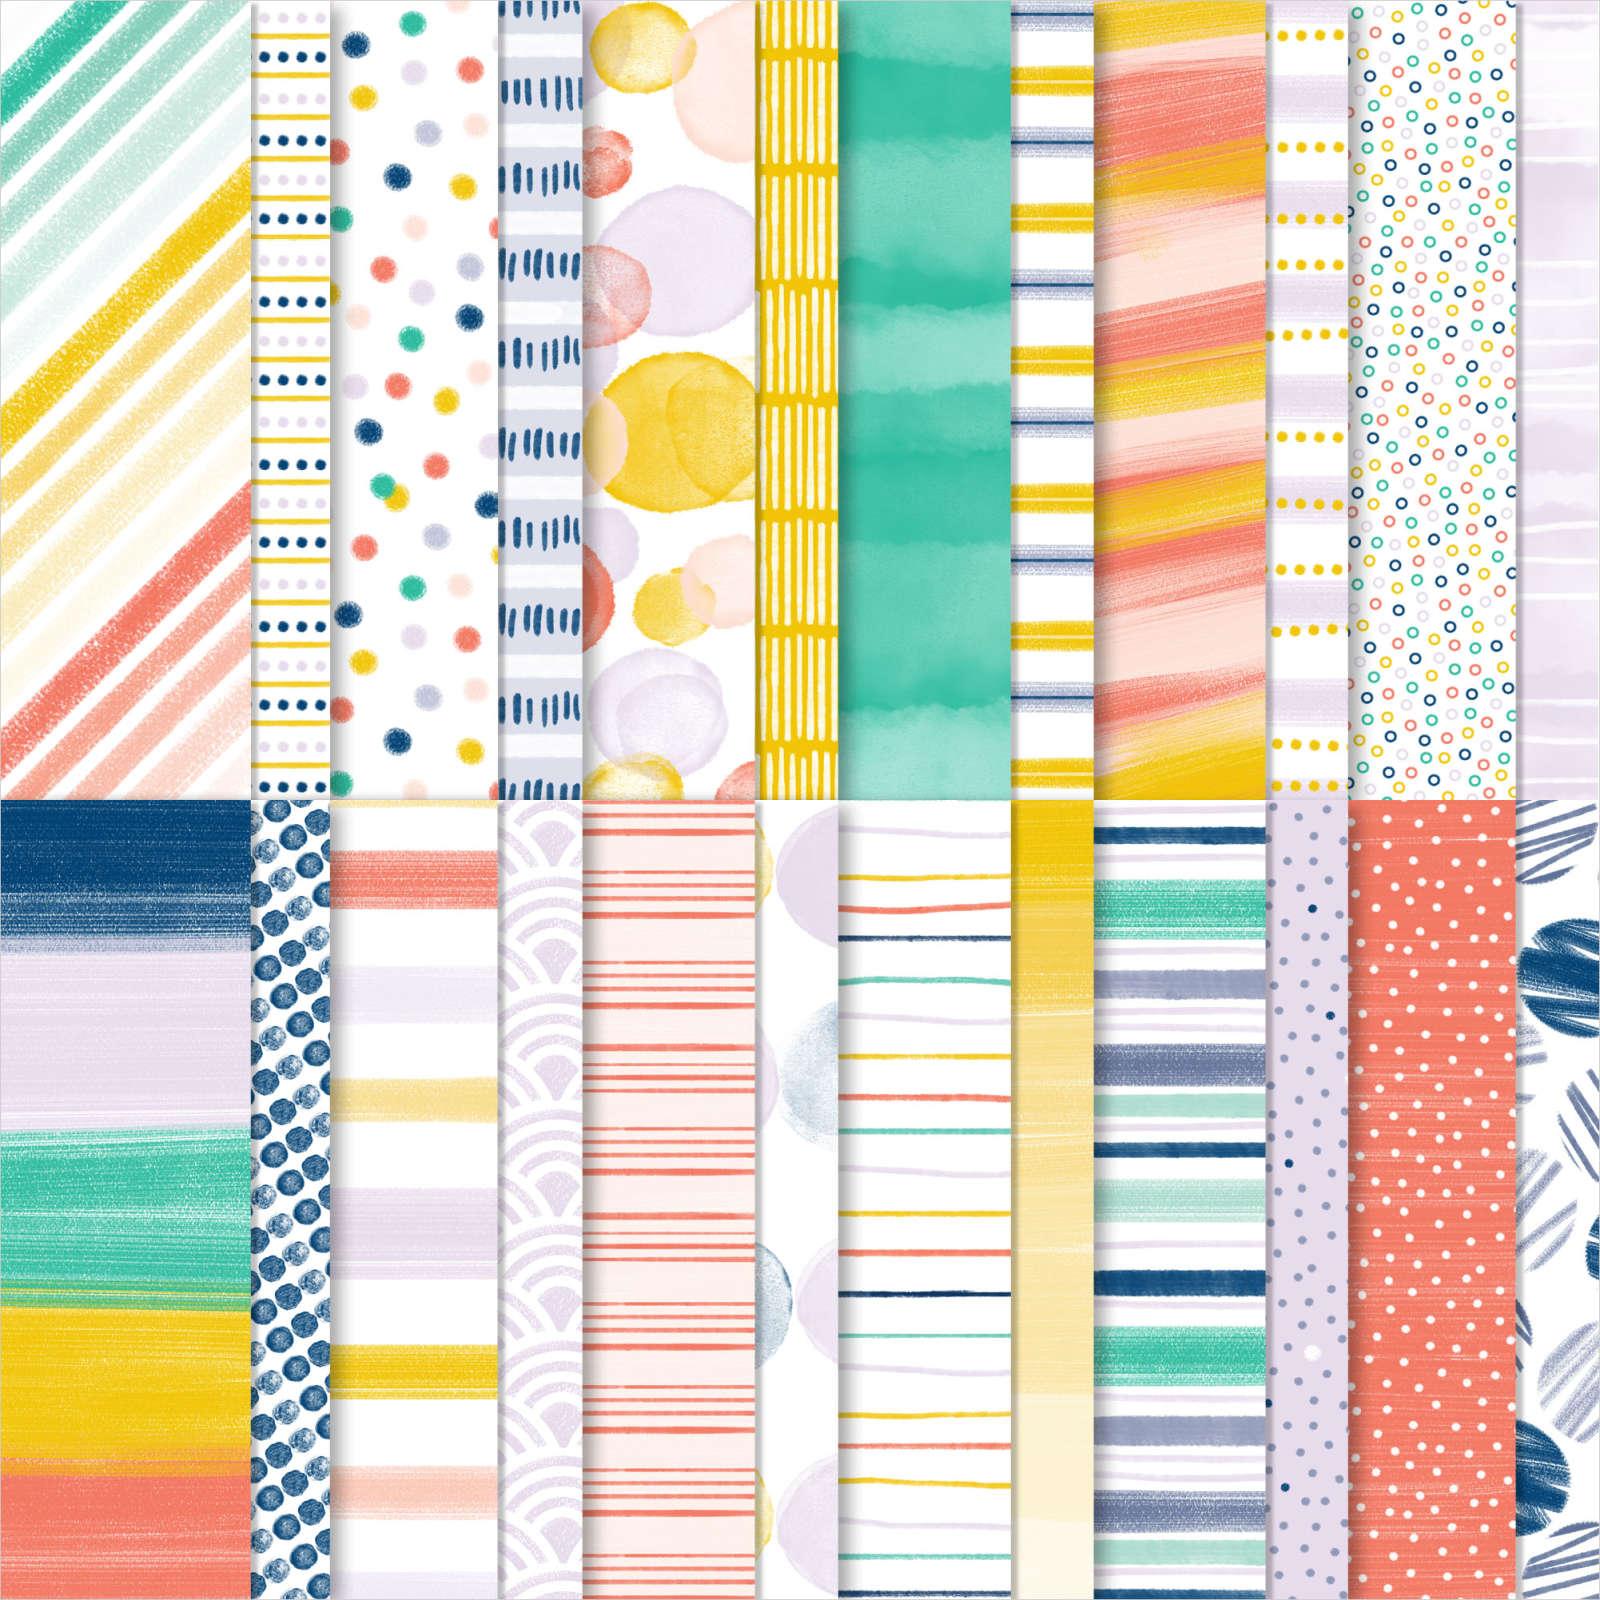 papier-stampinup-design-desir2scrap